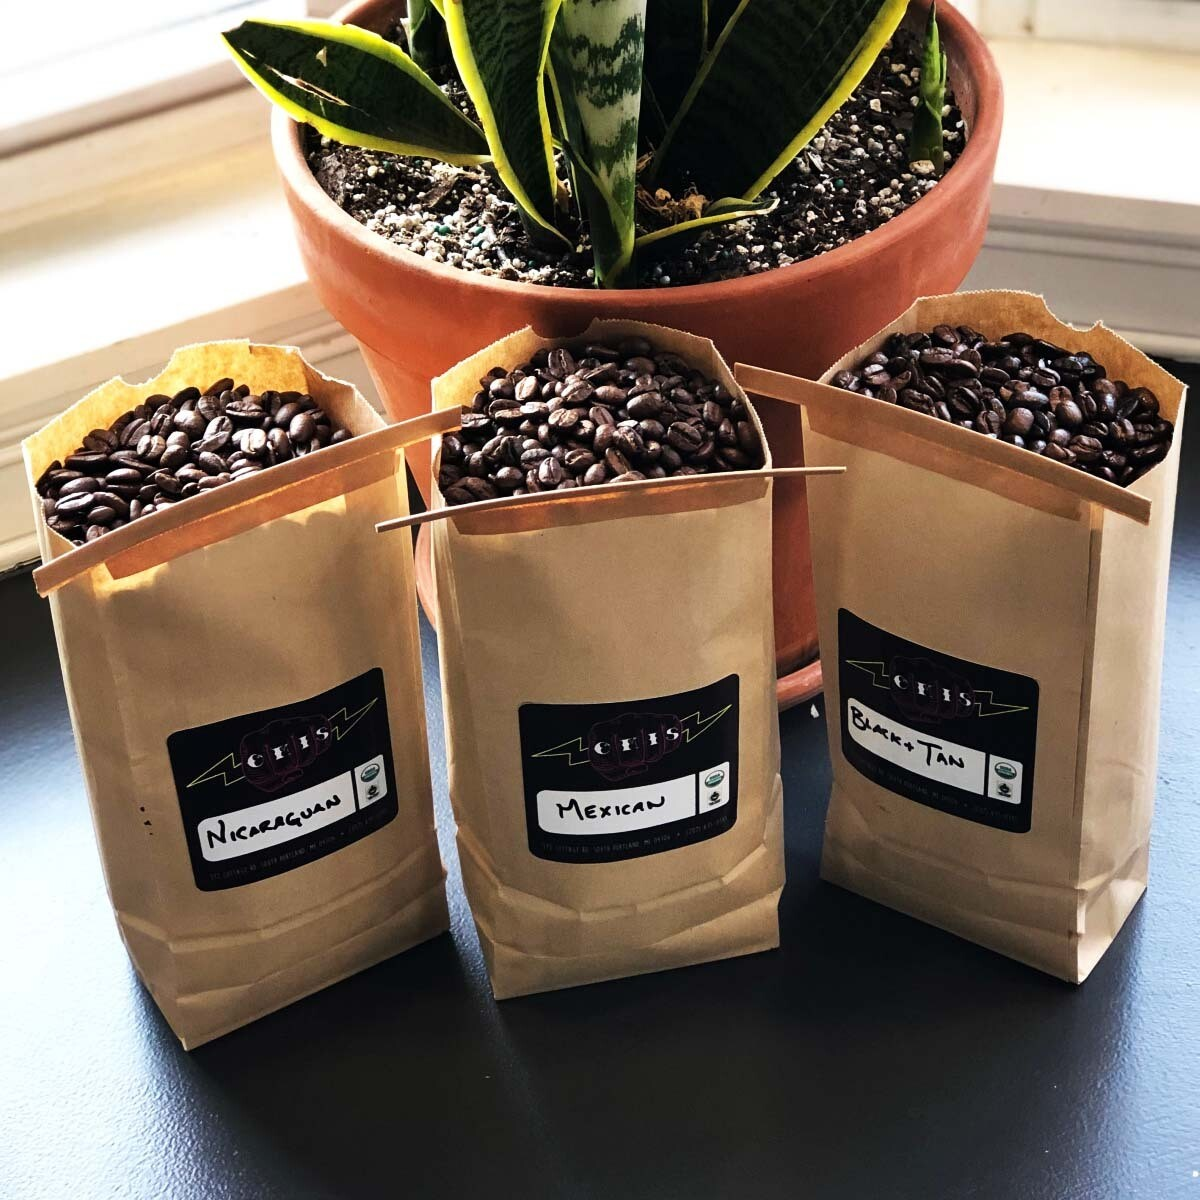 12oz Bag Of Coffee